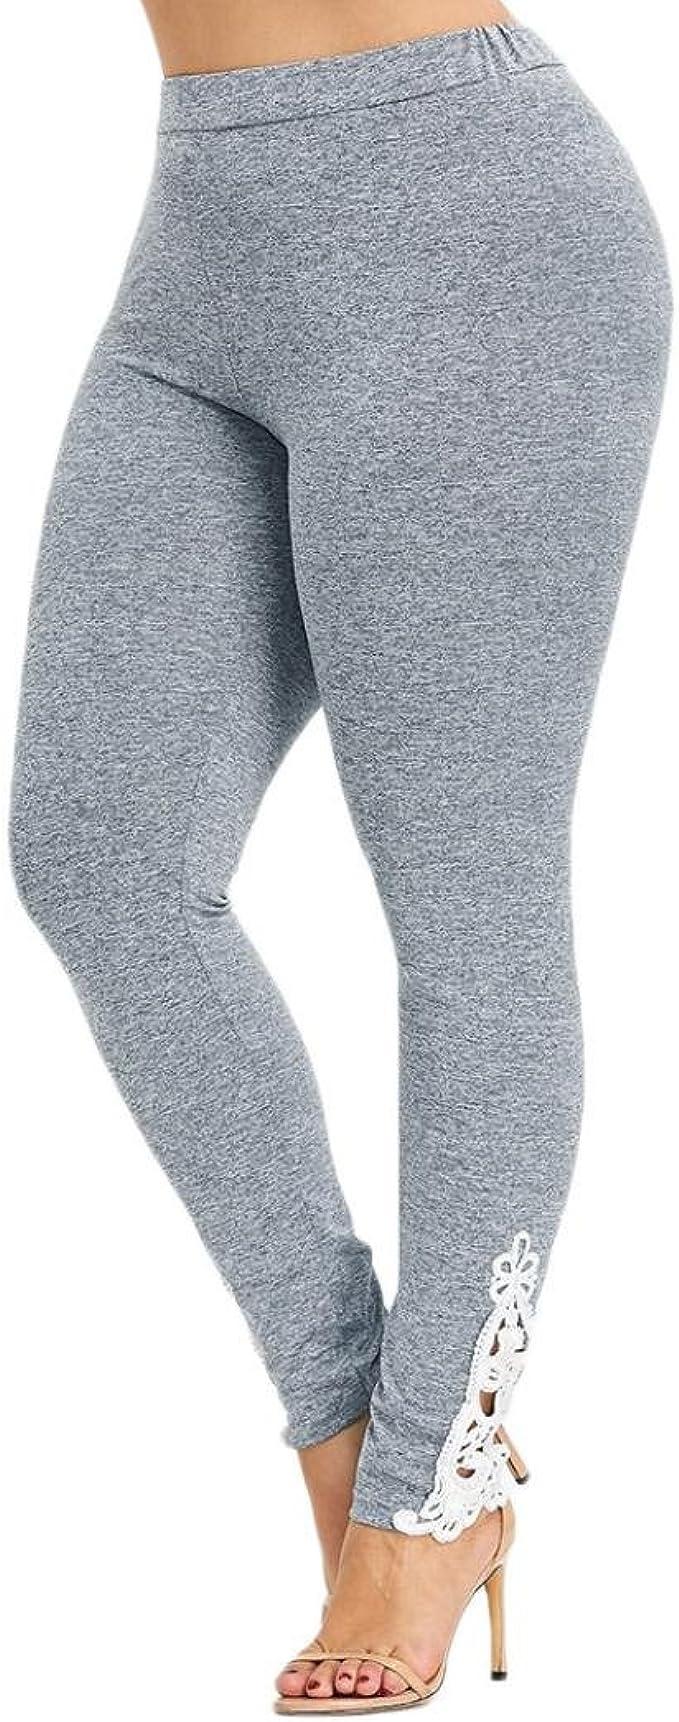 FAMILIZO_Leggings Mujer Talla Grande Leggings Mujer Yoga ...